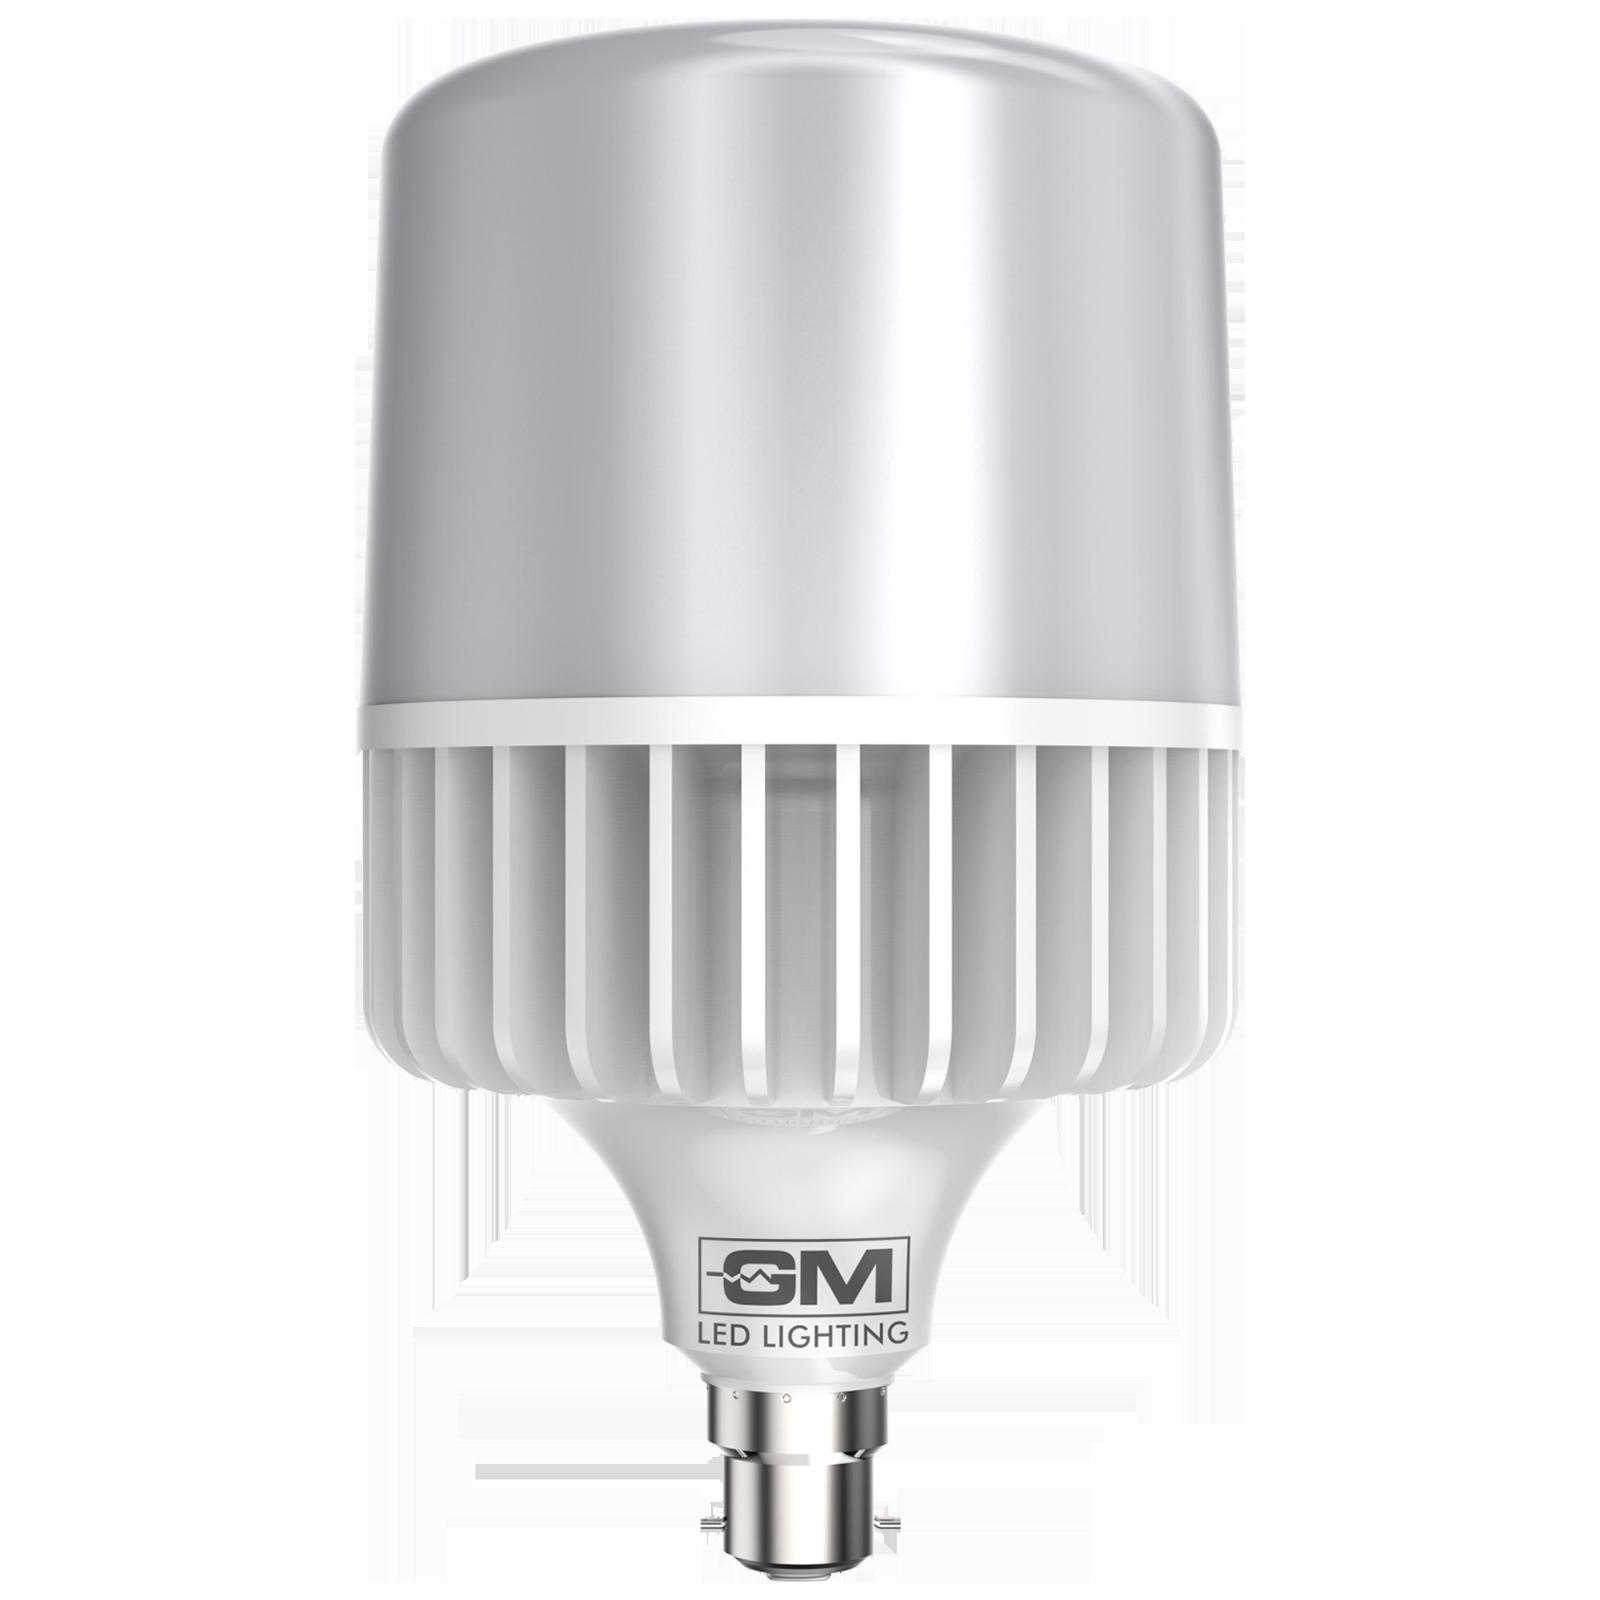 GM GLO 30 Watts Electric Powered LED Bulb (3000 Lumens, GBT-30-6.5K, White)_1